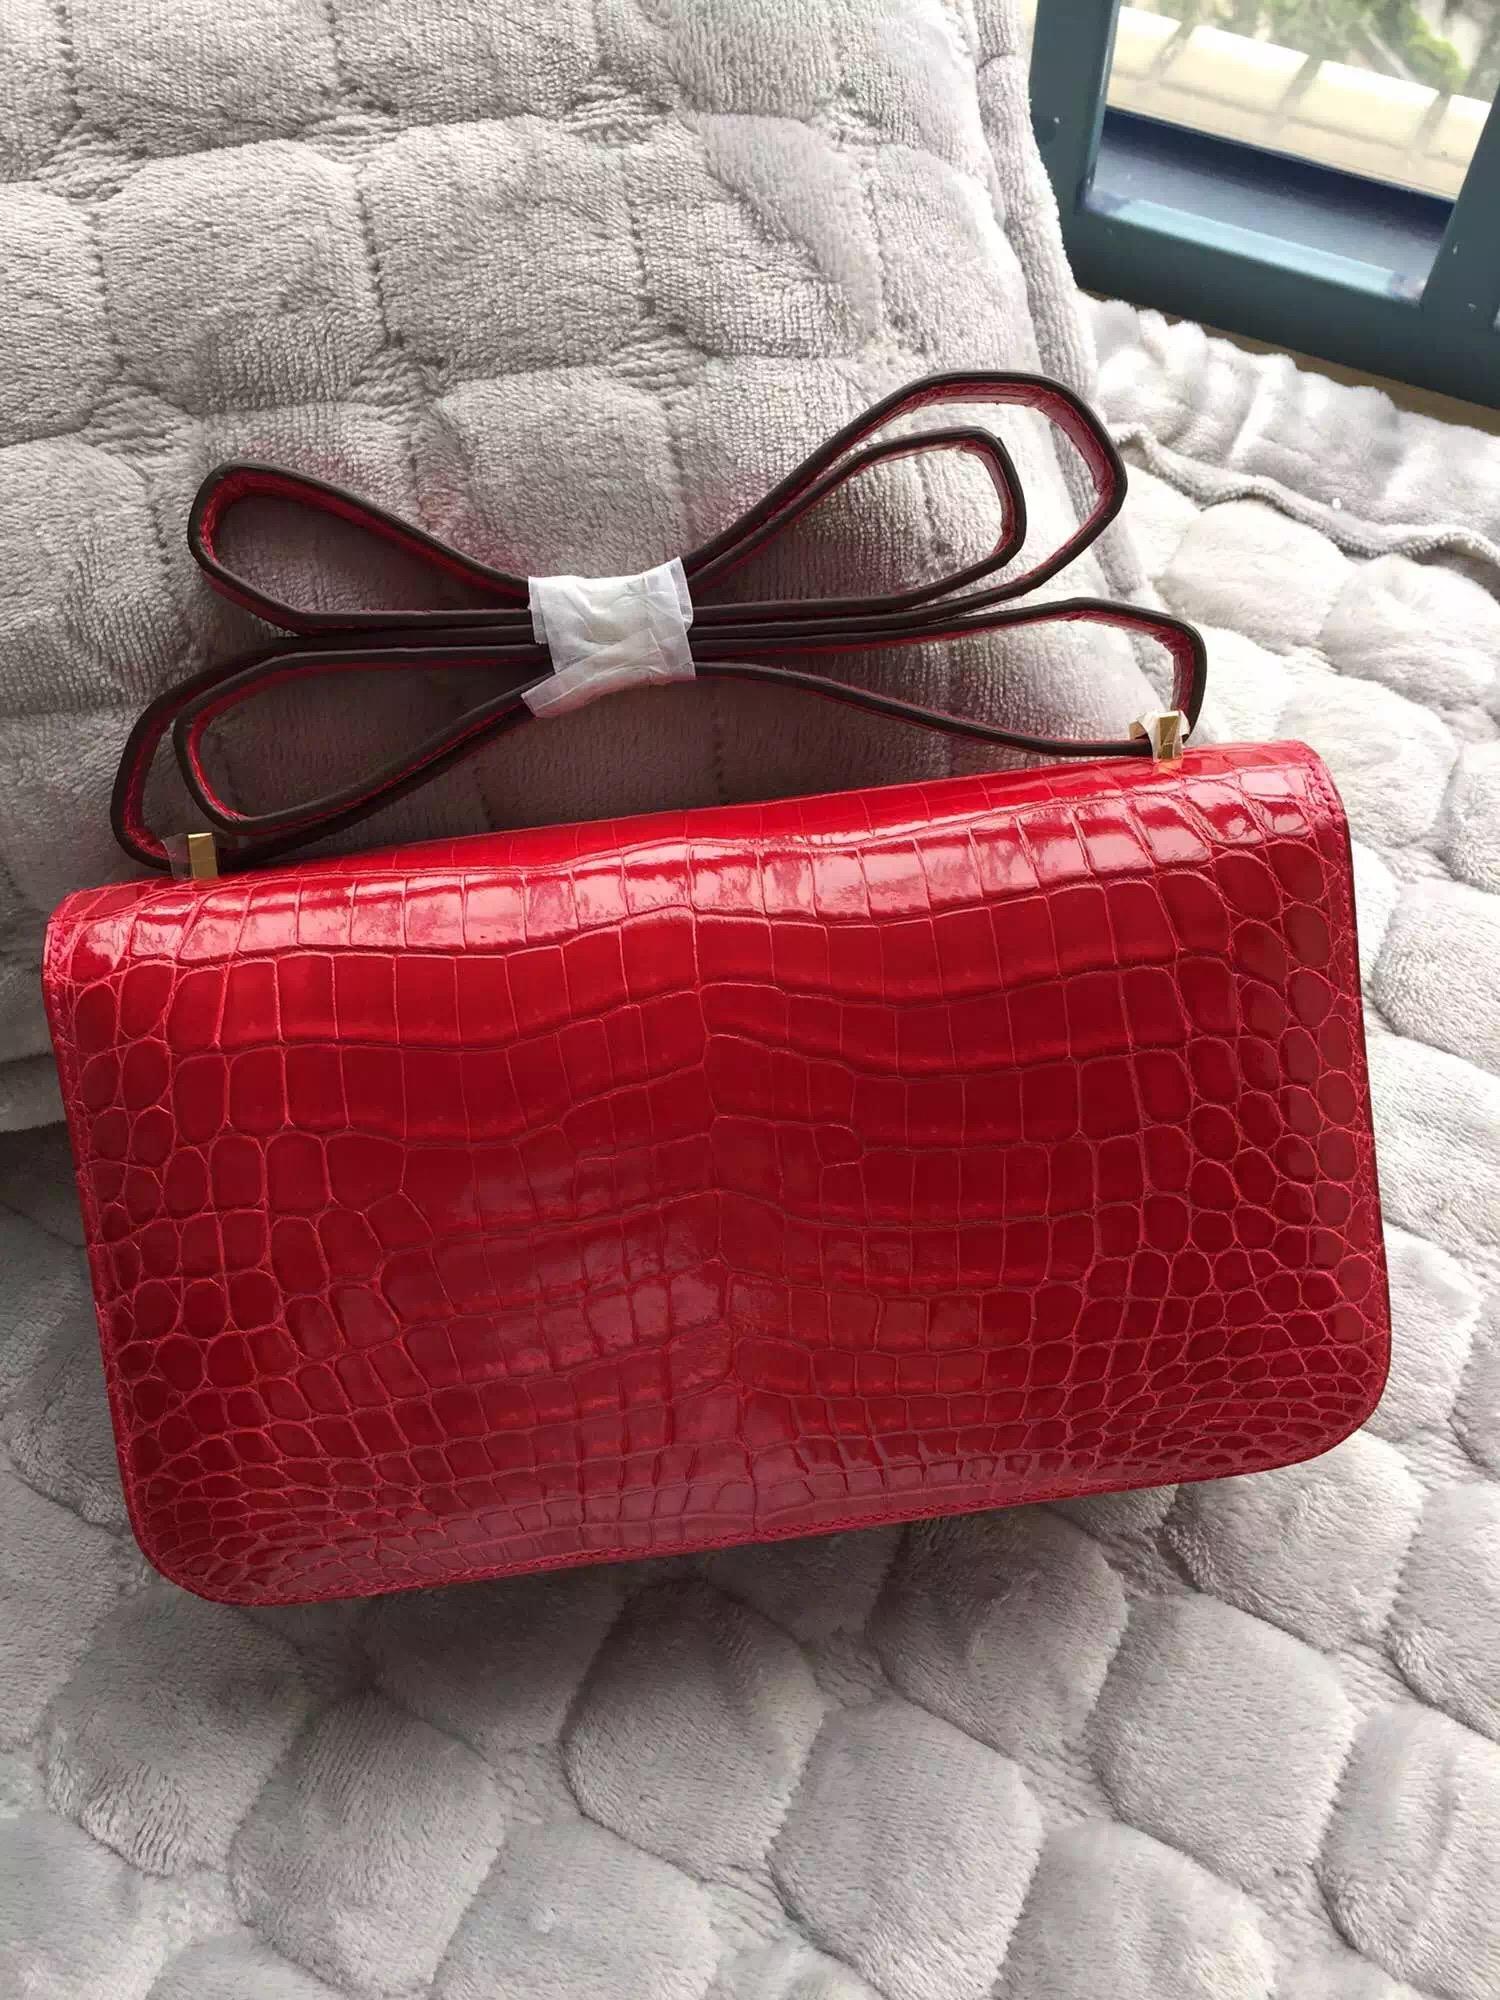 Discount Hermes Constance Bag Ferrari Red Shiny Crocodile Skin Cross-body Bag 26cm